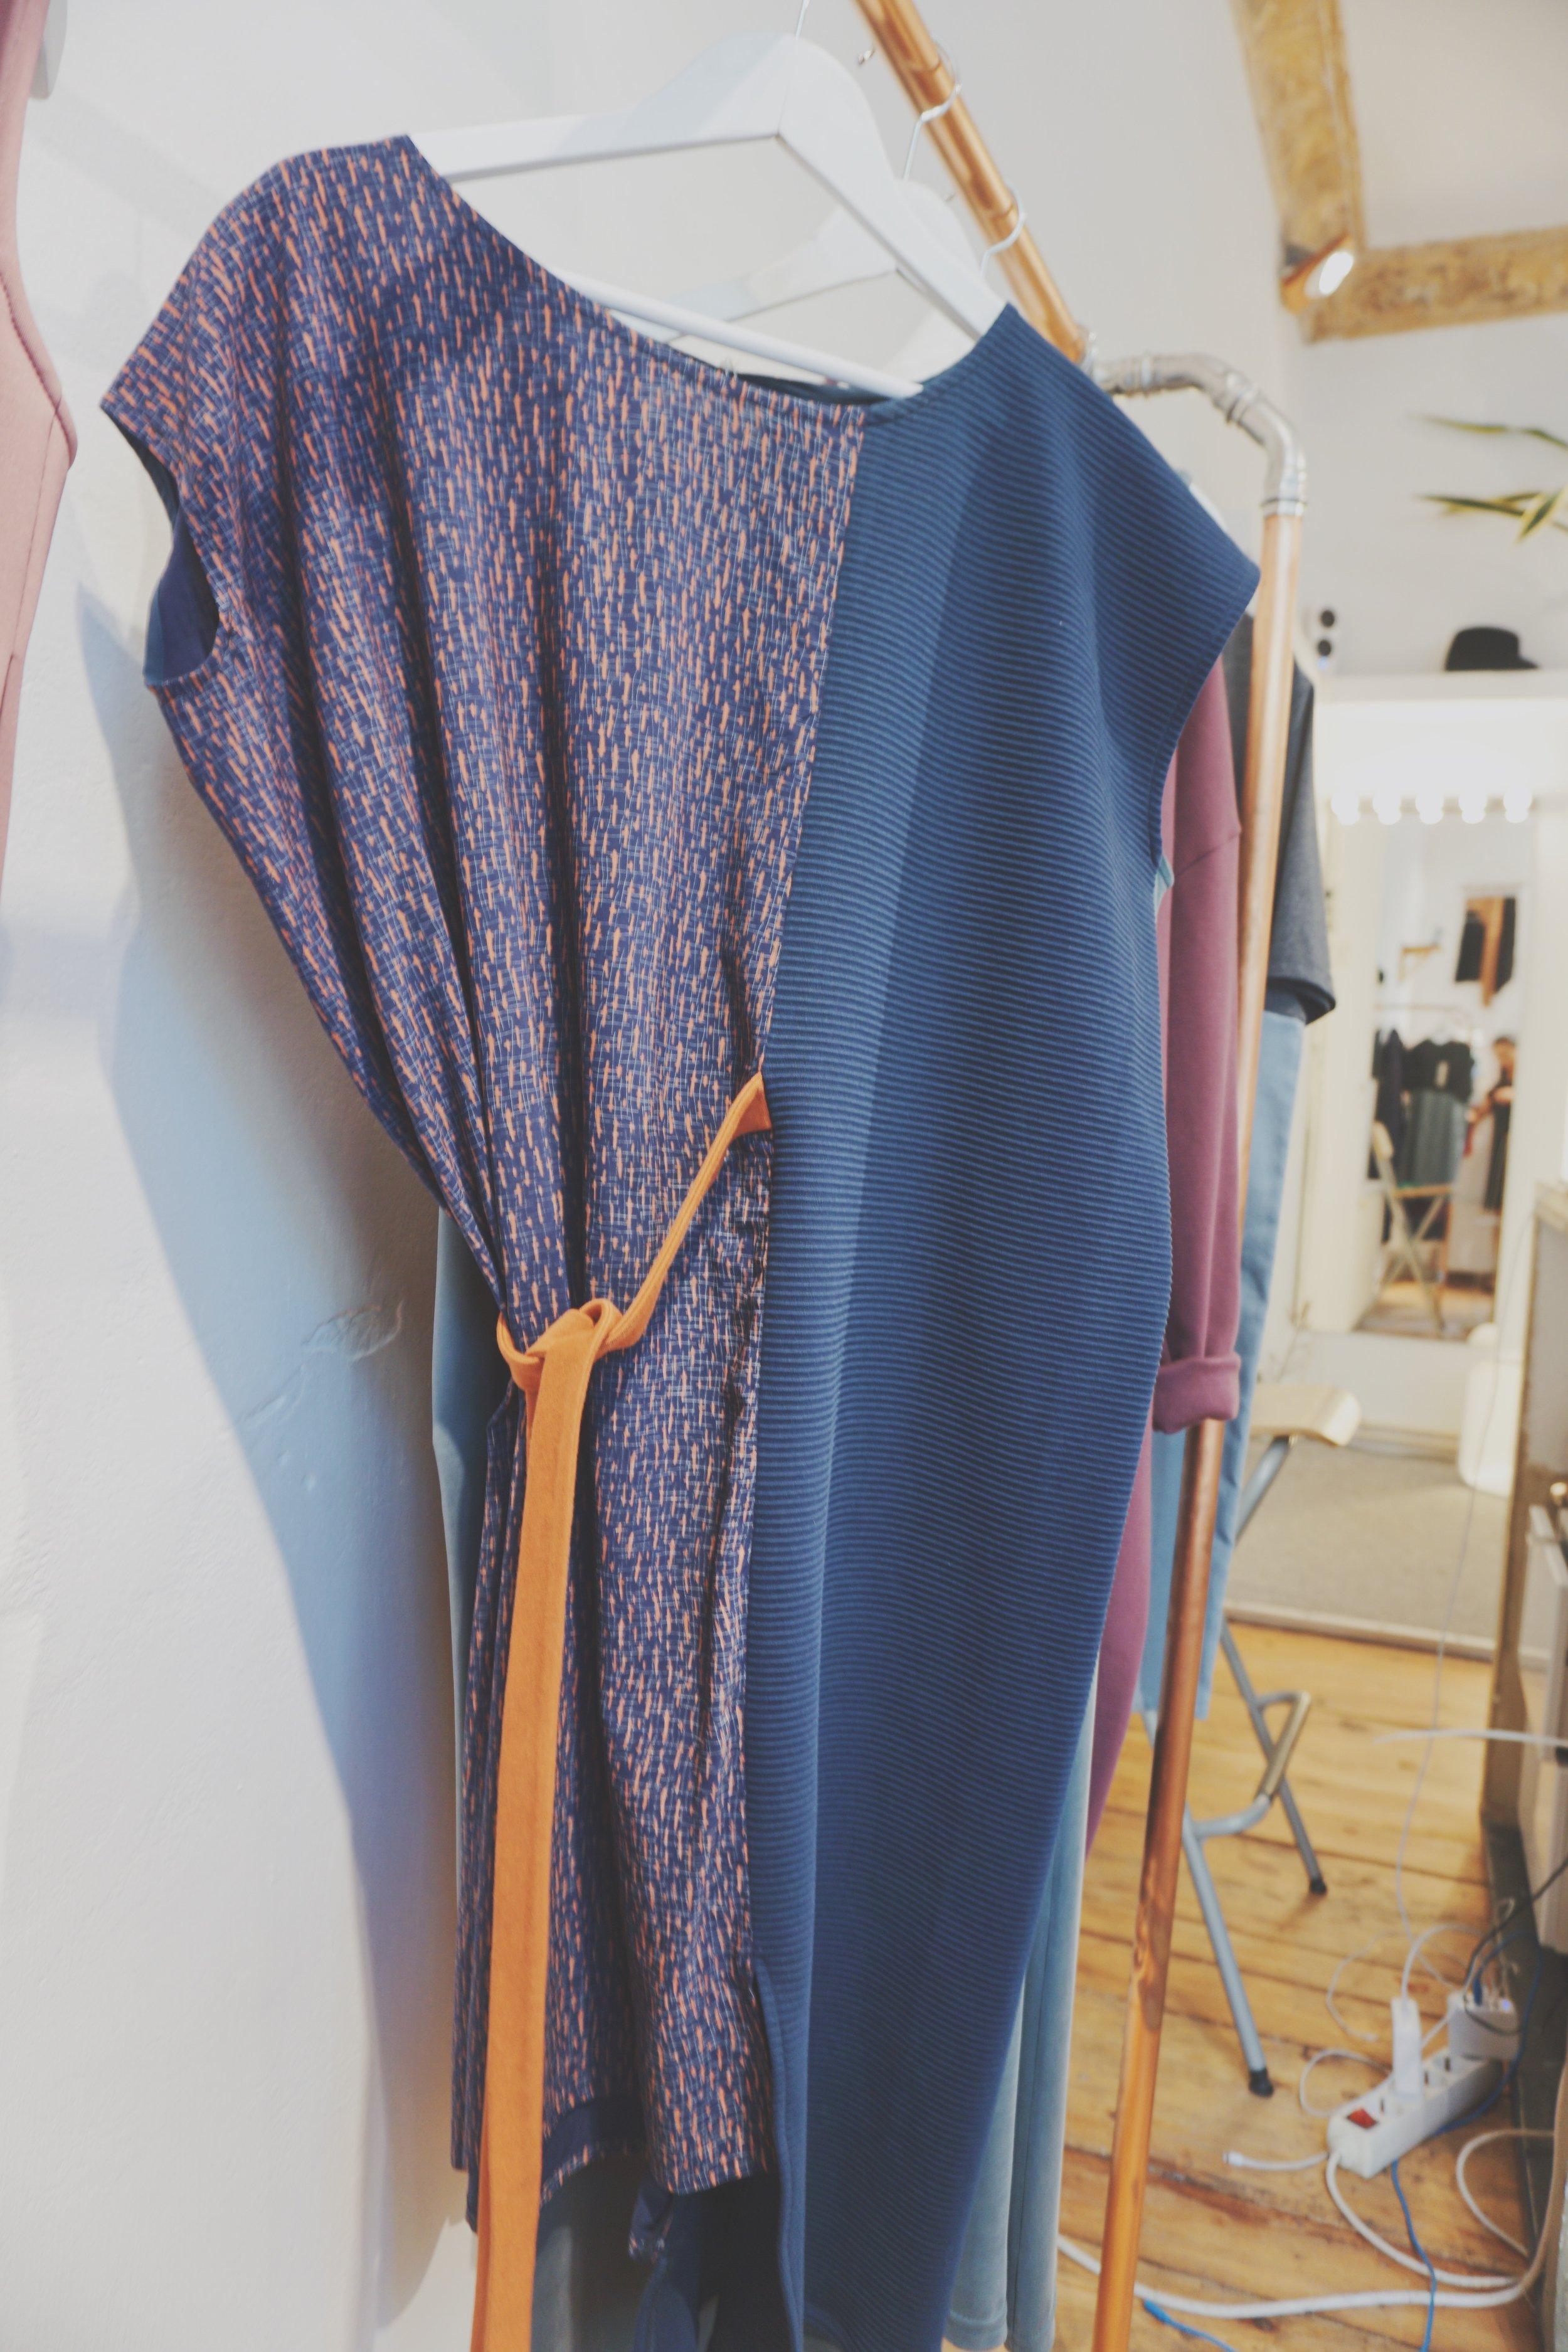 Collaboration 1 dress